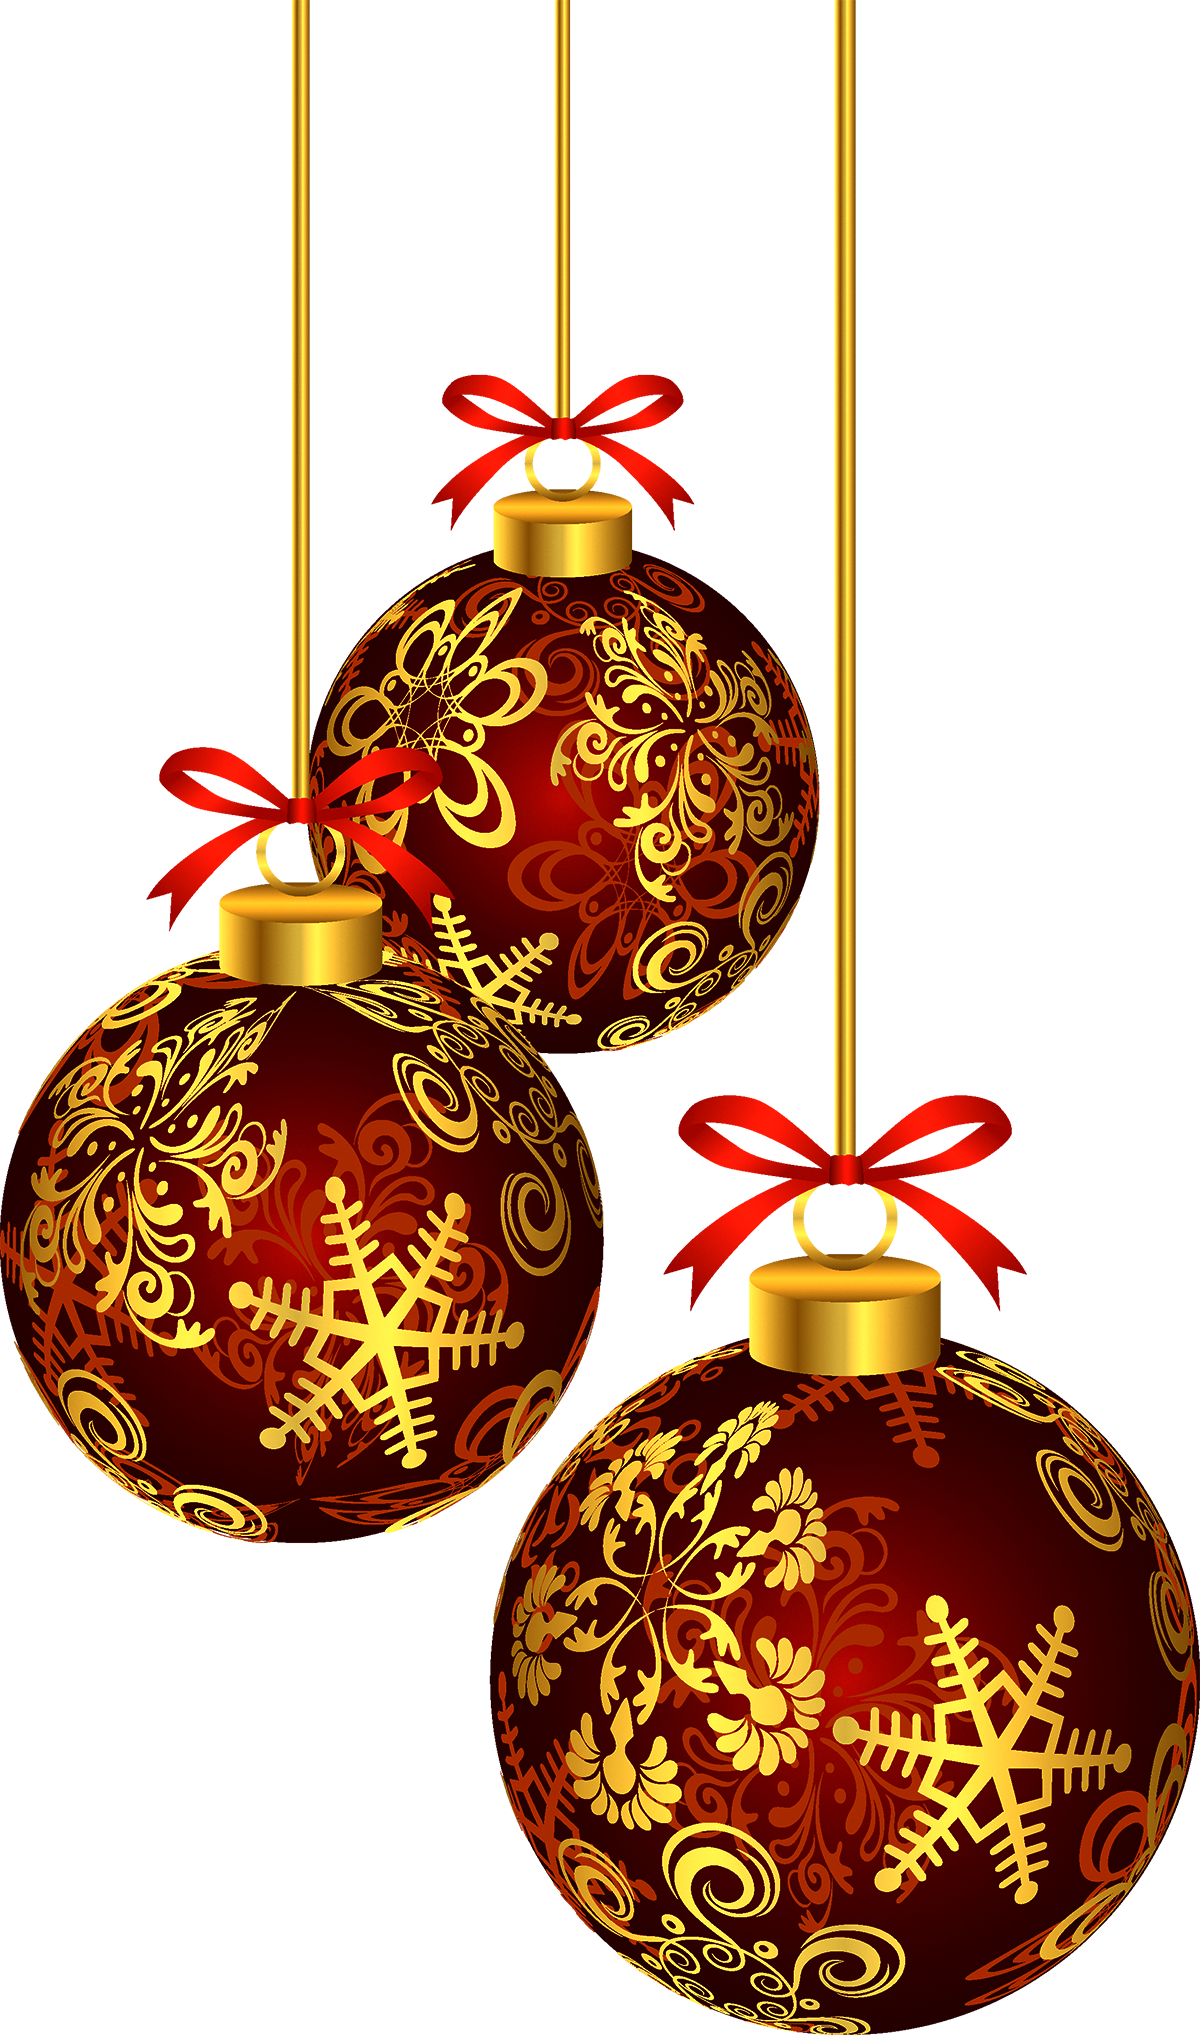 Christmas New Year golden ball Christmas PNG image